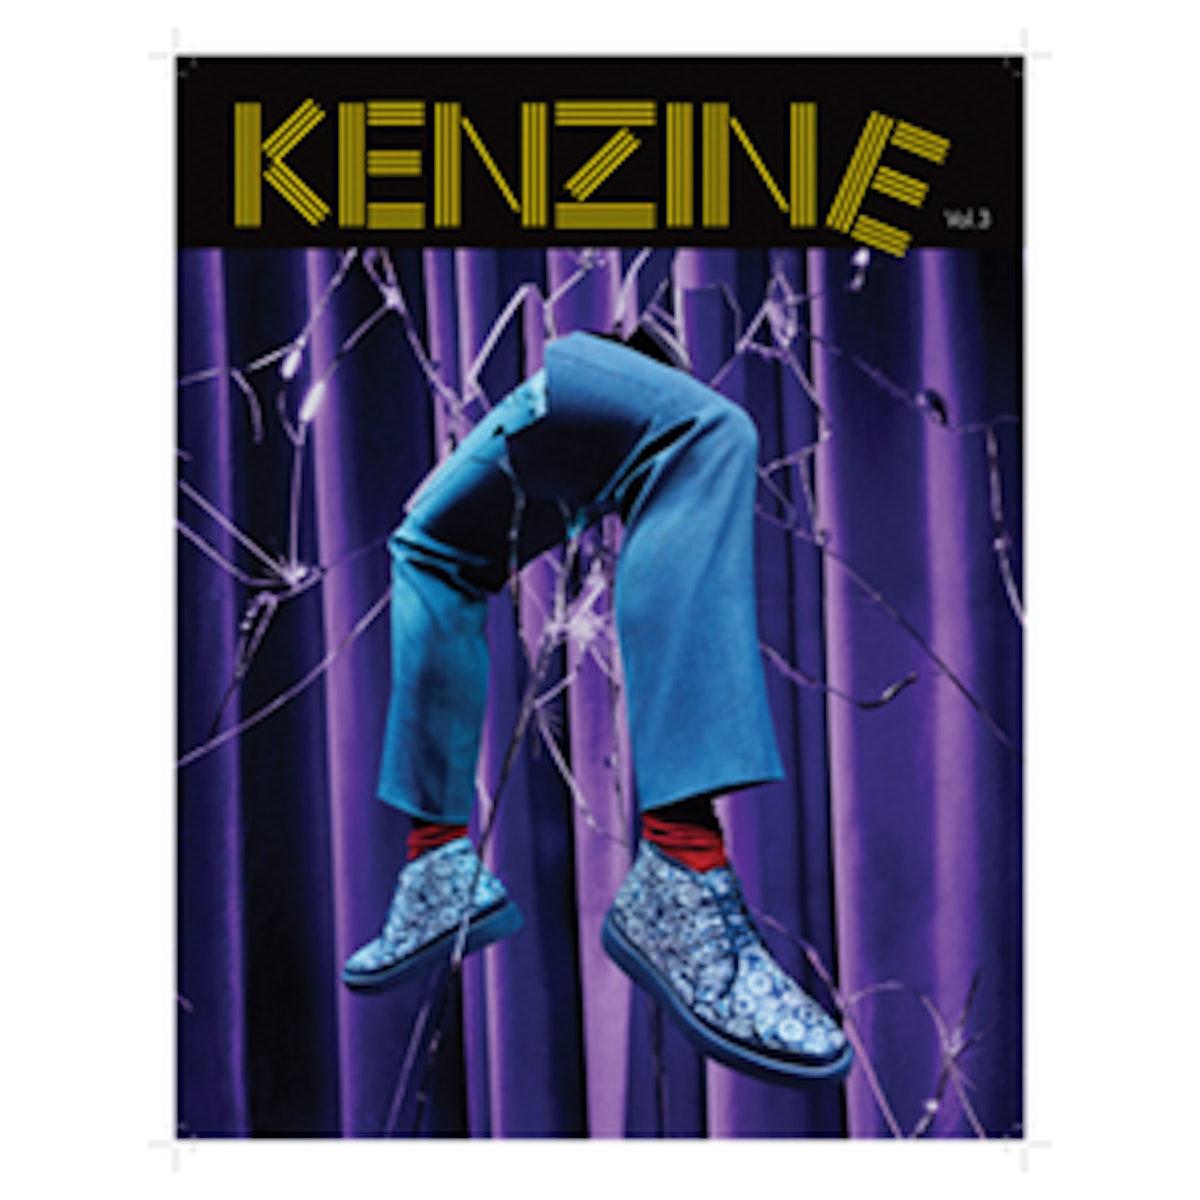 Kenzine: Volume III (Pre-Order)